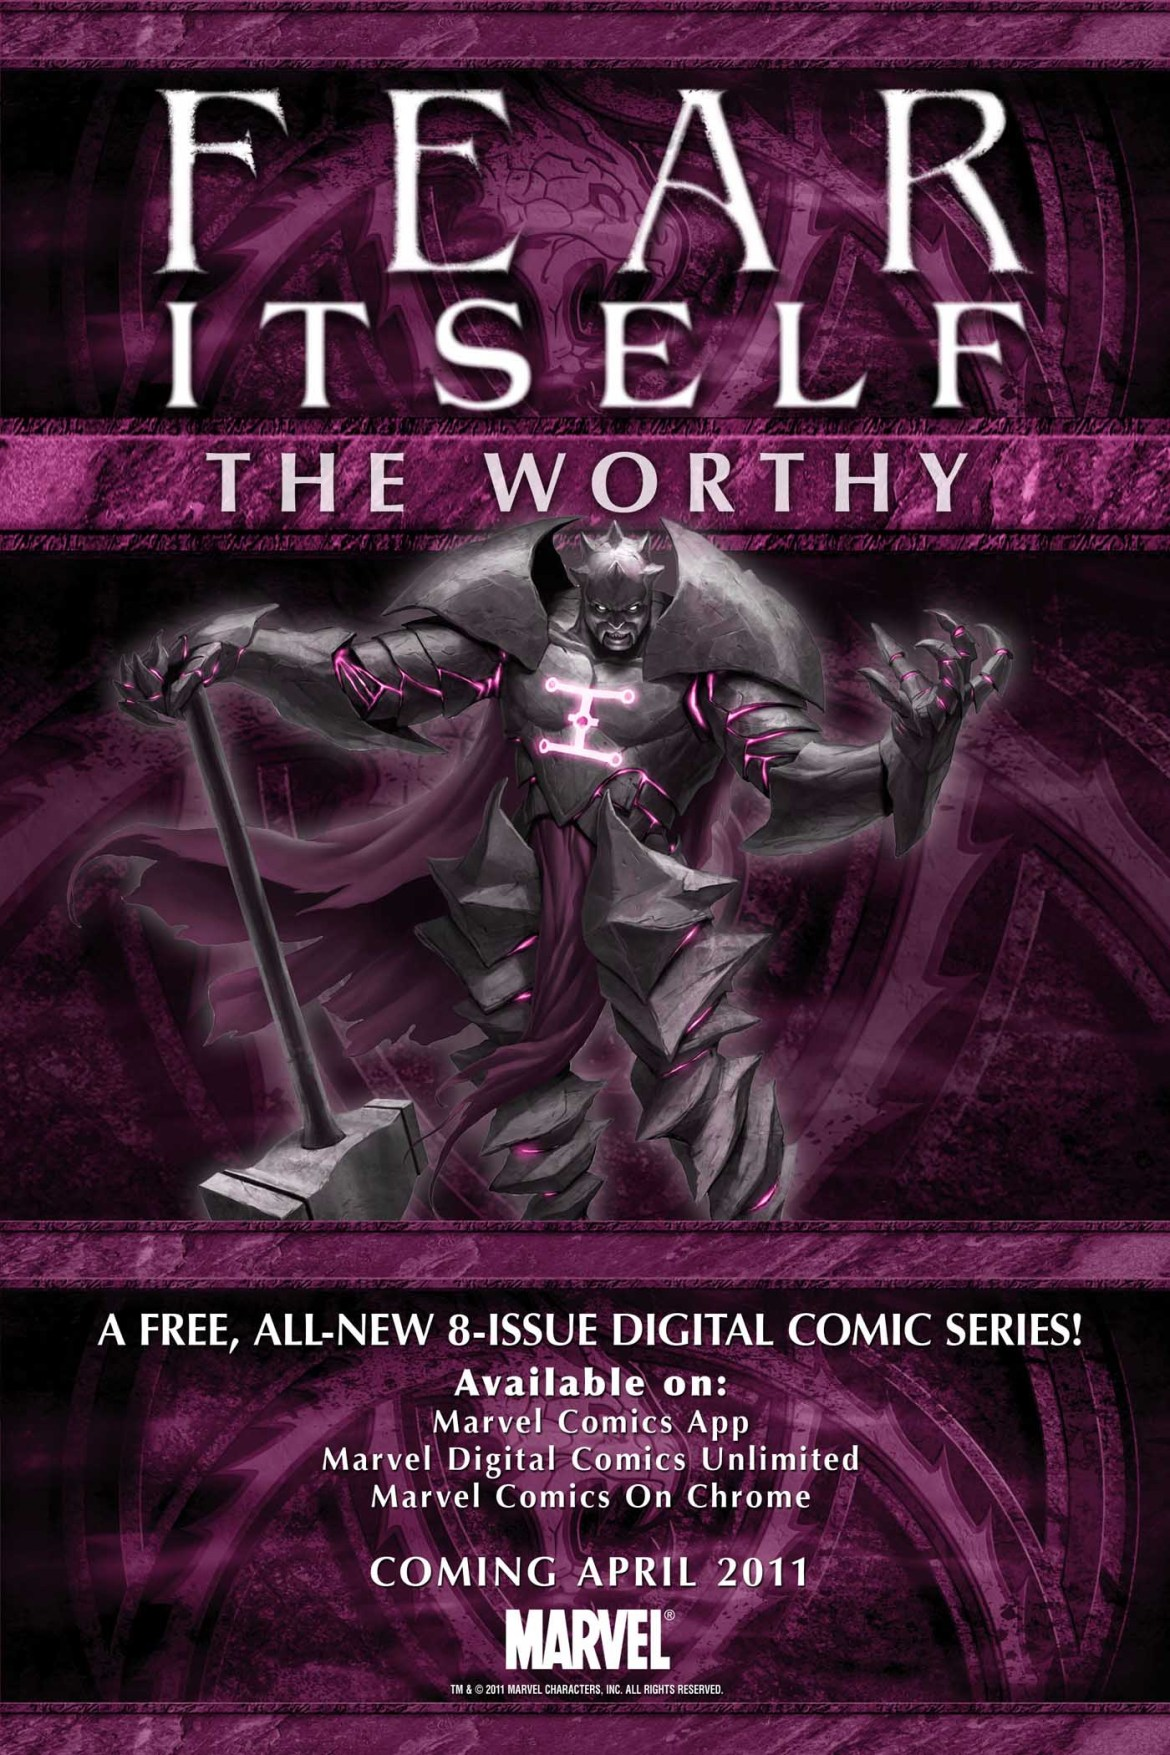 FEAR_ITSELF_THE_WORTHY Marvel announces FEAR ITSELF: THE WORTHY